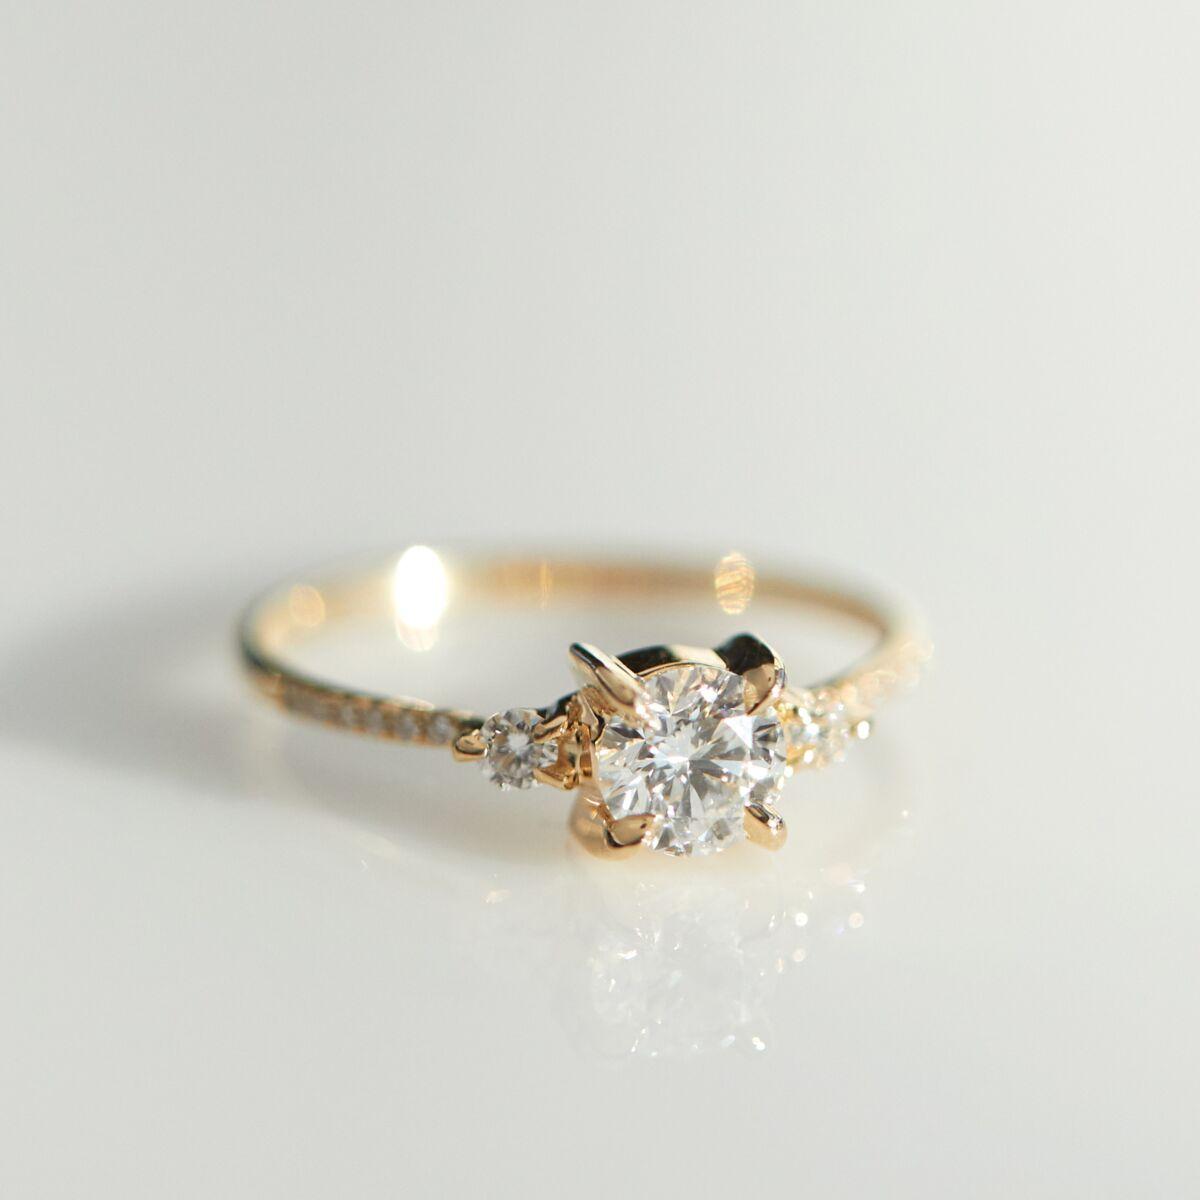 Anna the Swan, Supreme (Cultivated Diamonds) image